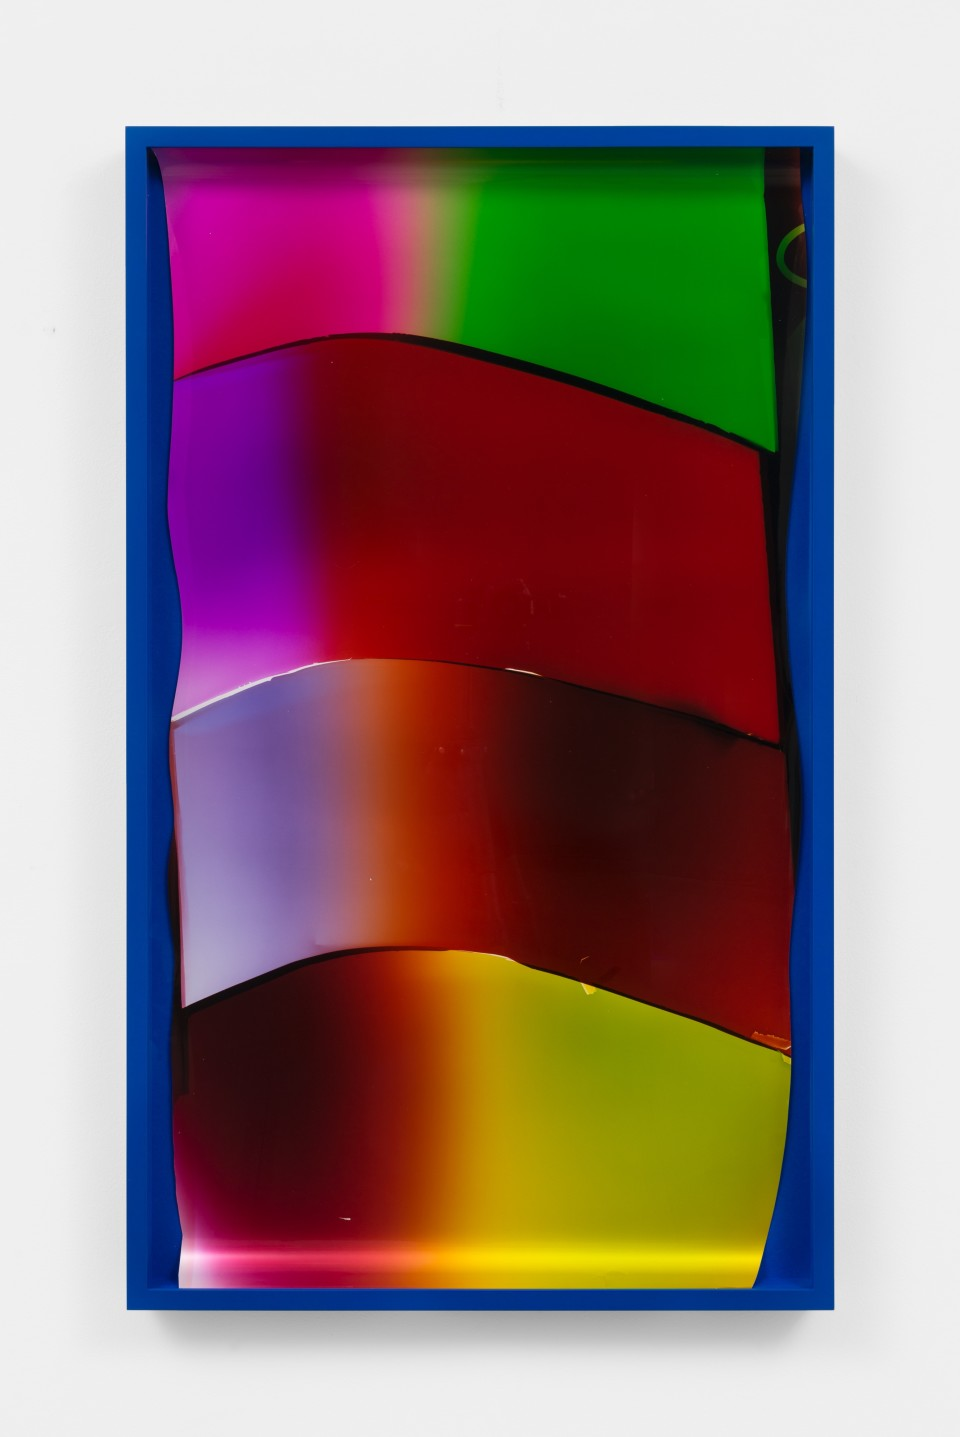 Image: Mariah Robertson  171, 2020  unique chromogenic print  49 3/4 x 29 3/4 inches (126.4 x 75.6 cm)